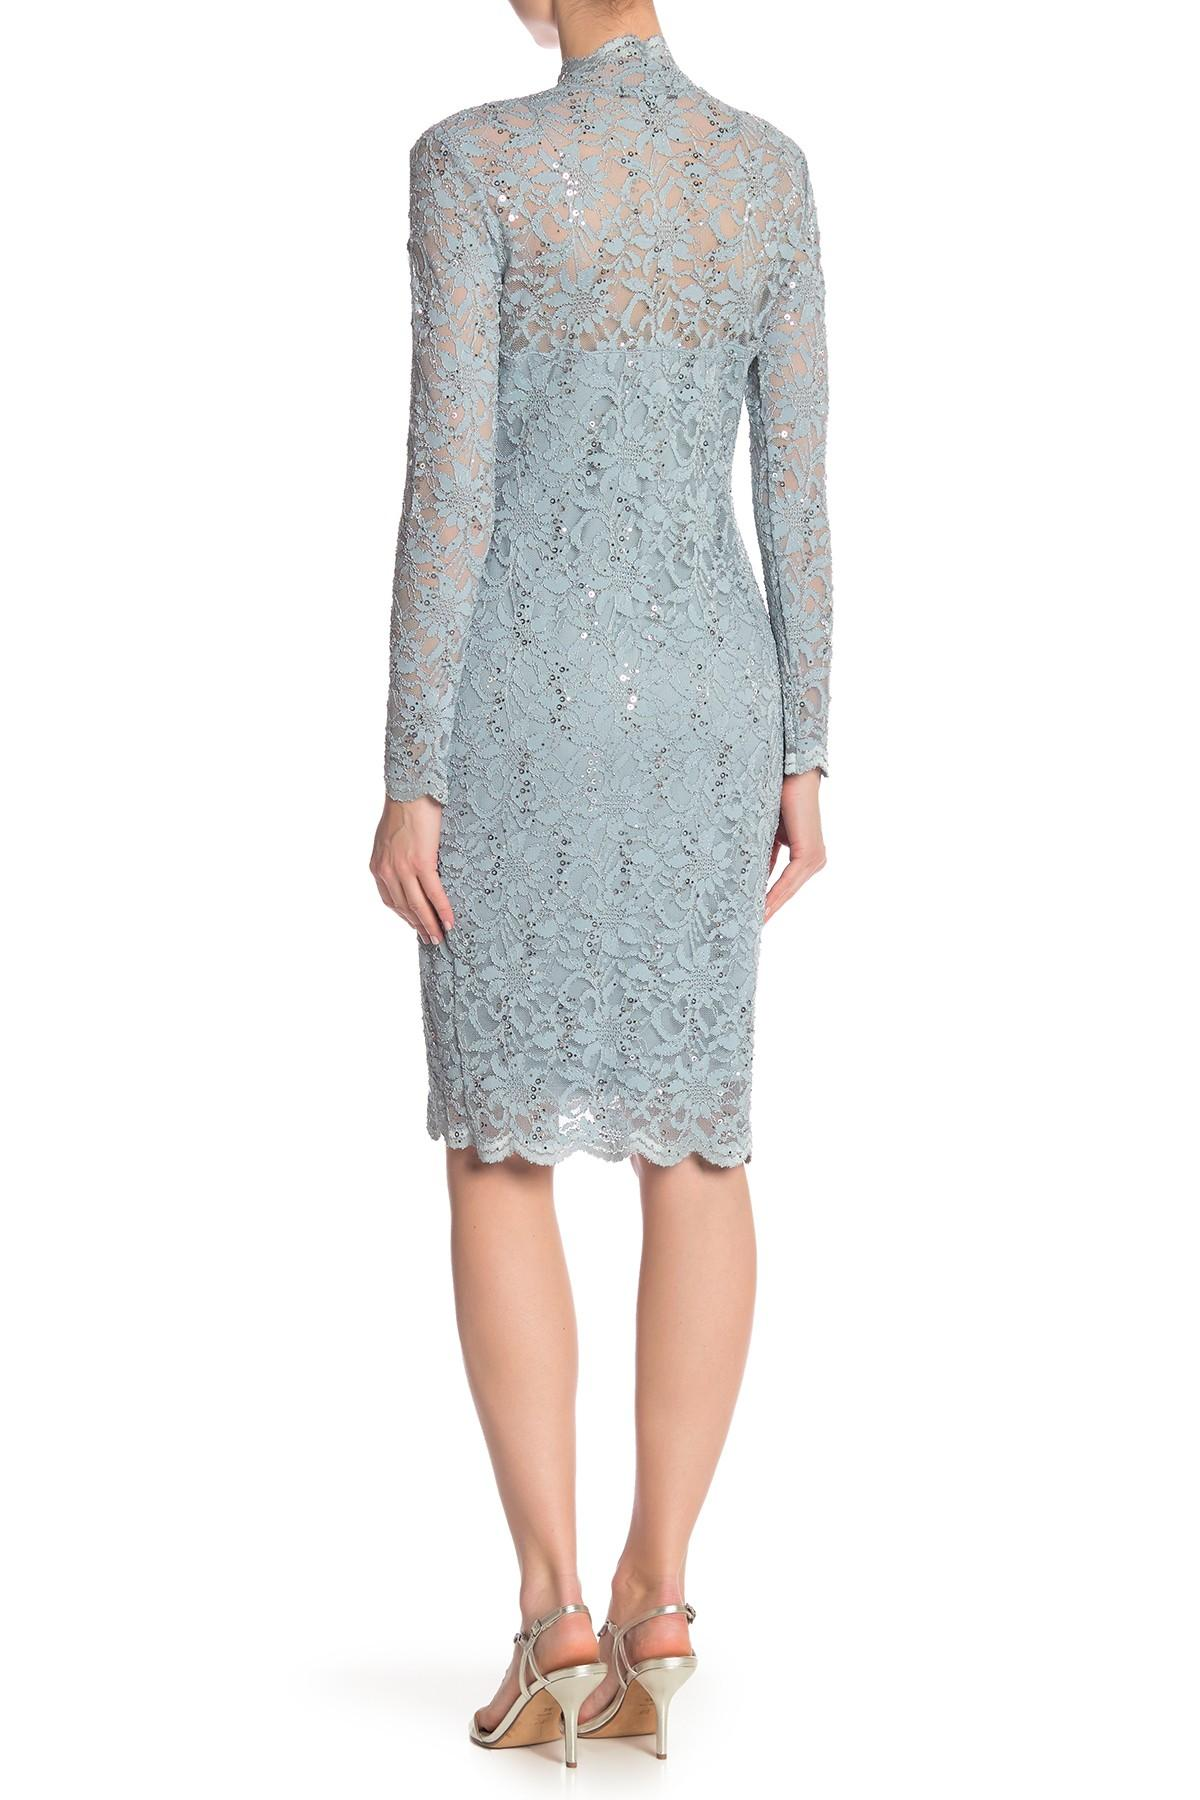 4cc818c51636 Marina - Blue Scalloped Sequined Lace Dress - Lyst. View fullscreen